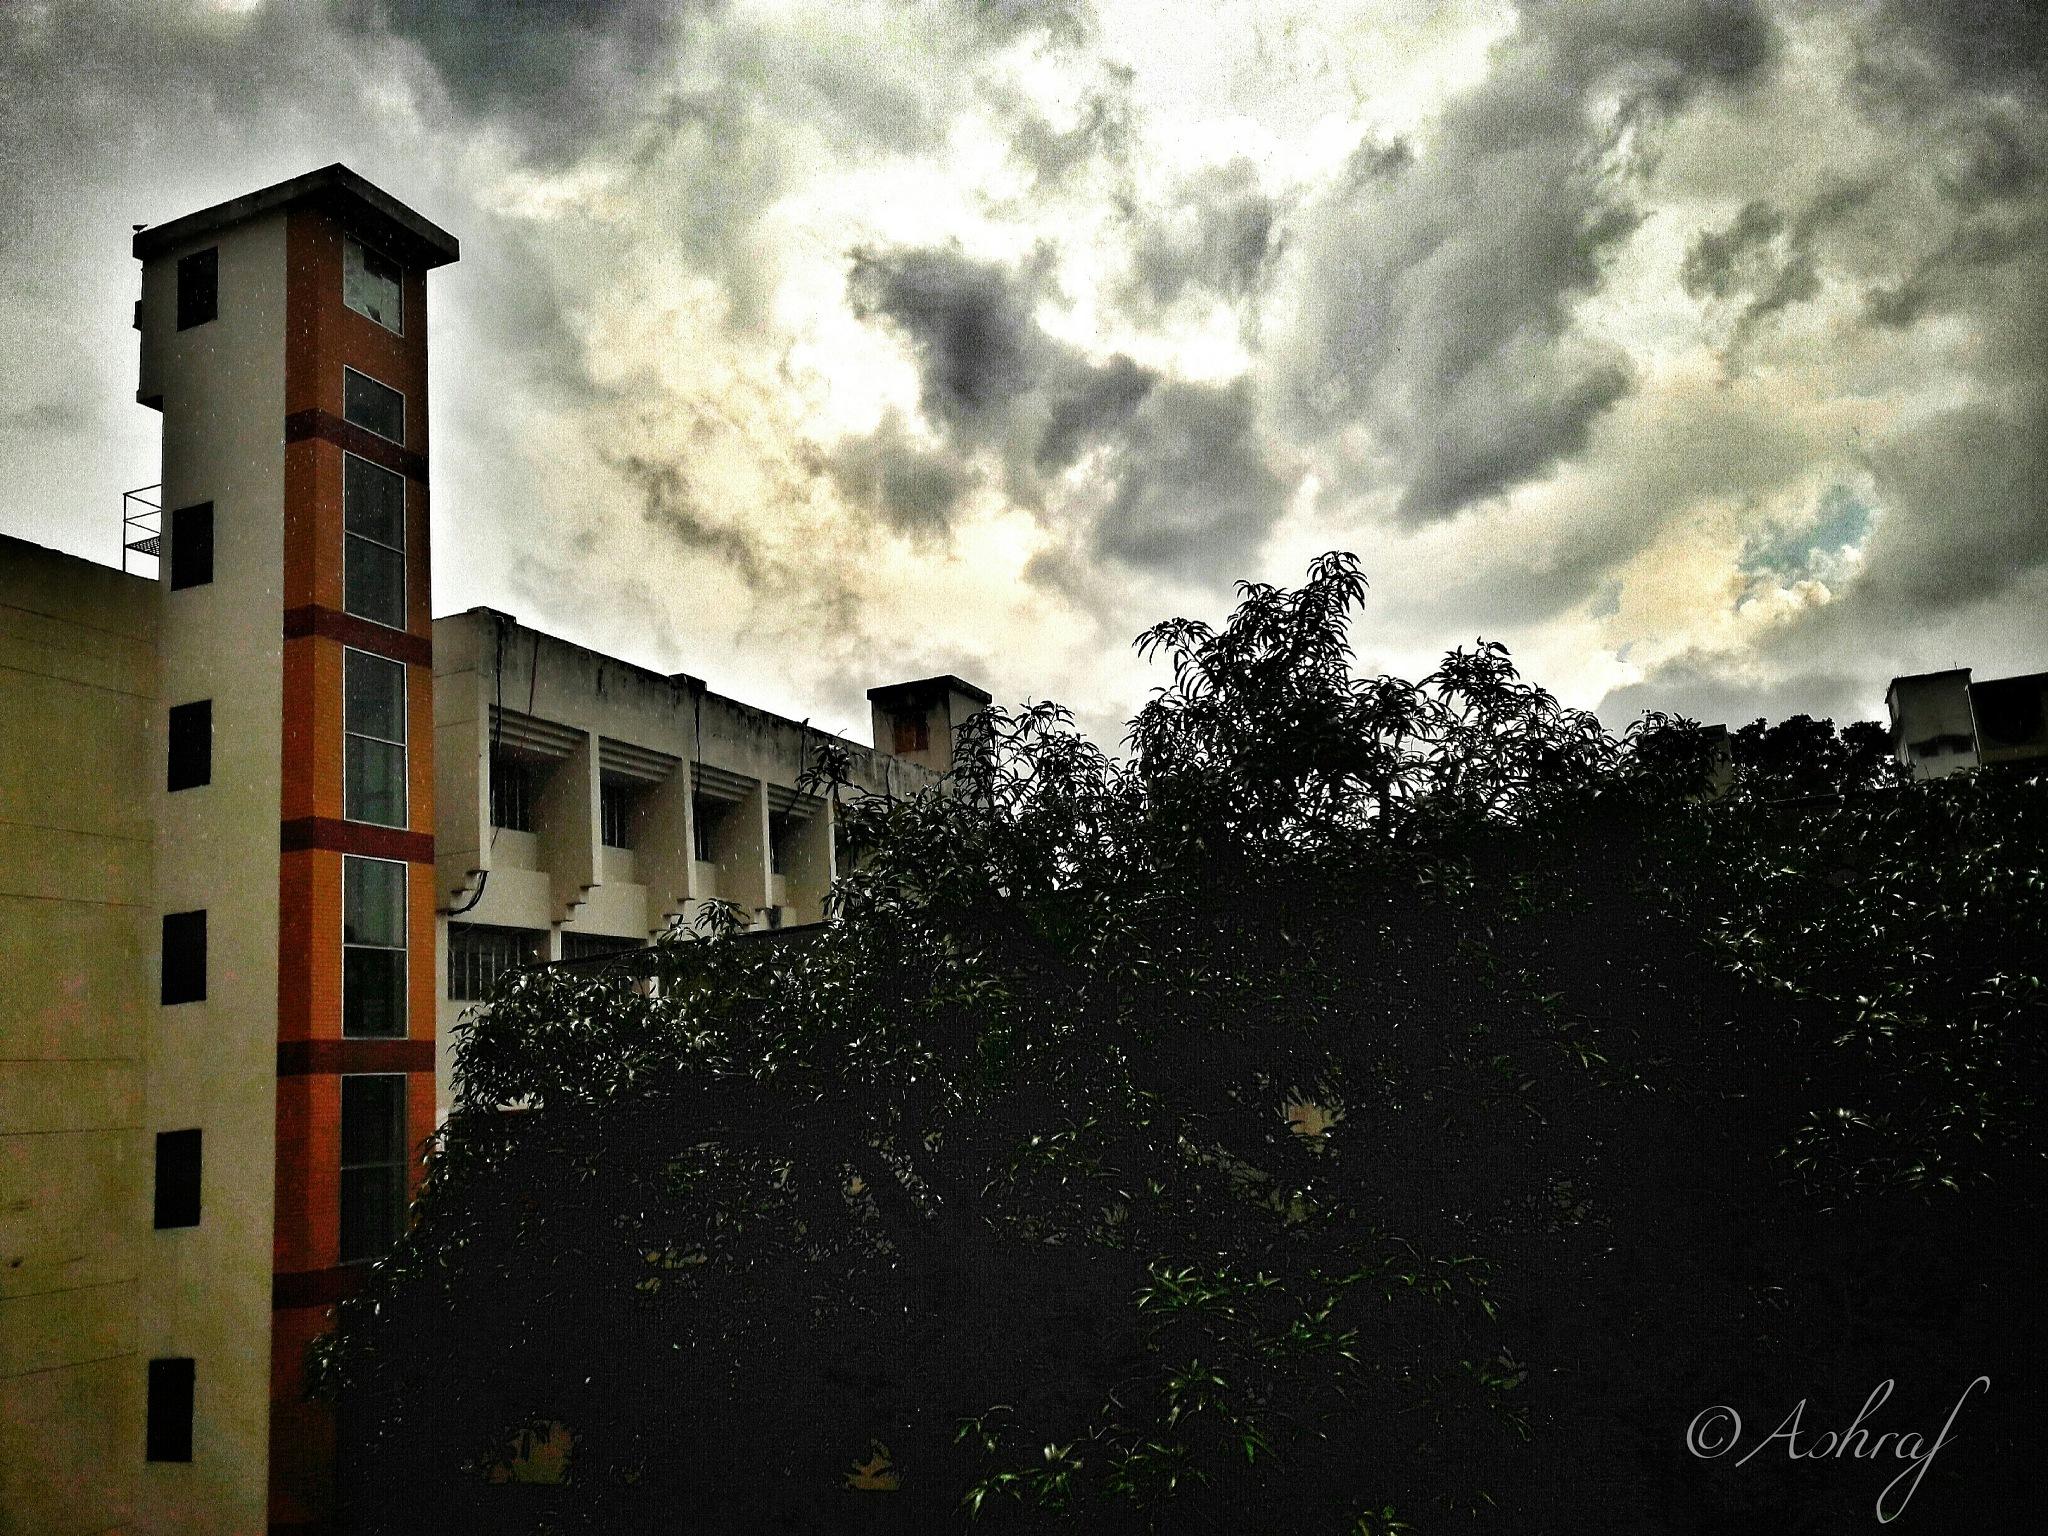 Darkness by Md. Ashraful Islam